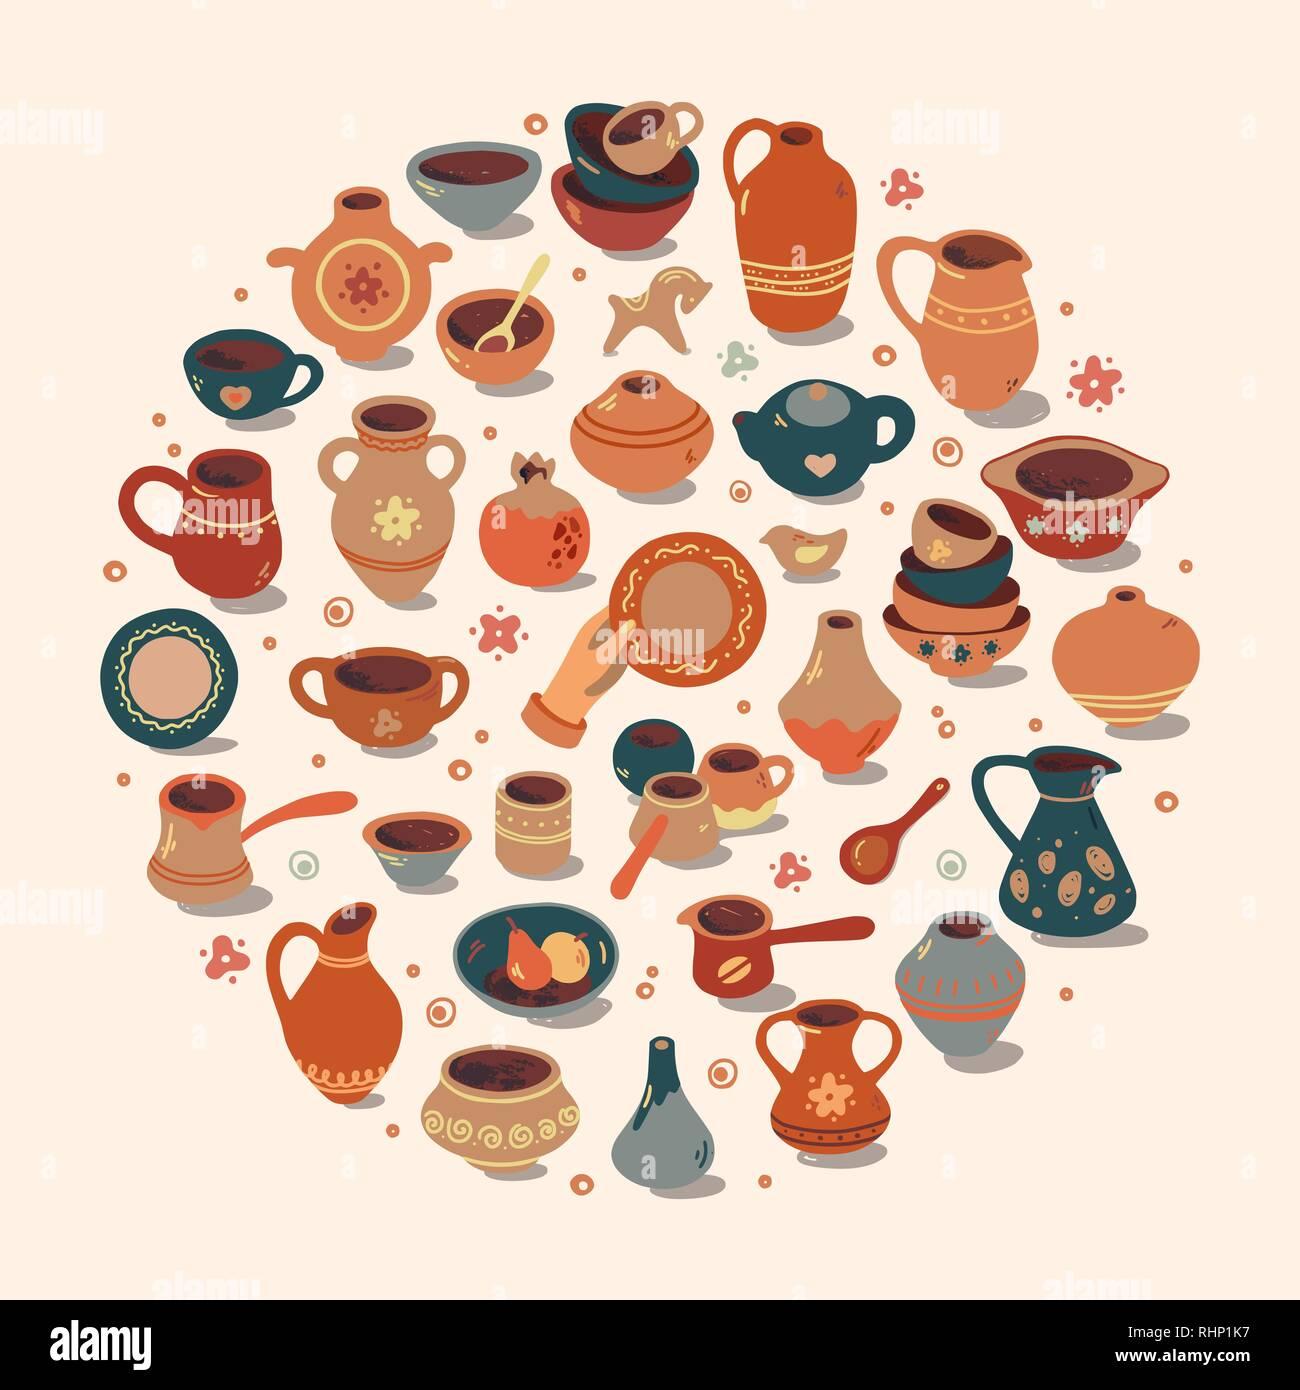 Pottery workshop, ceramics classes banner illustration. Vector line icon of clay studio tools. Hand building, sculpturing equipment. Art shop circle template. - Stock Vector